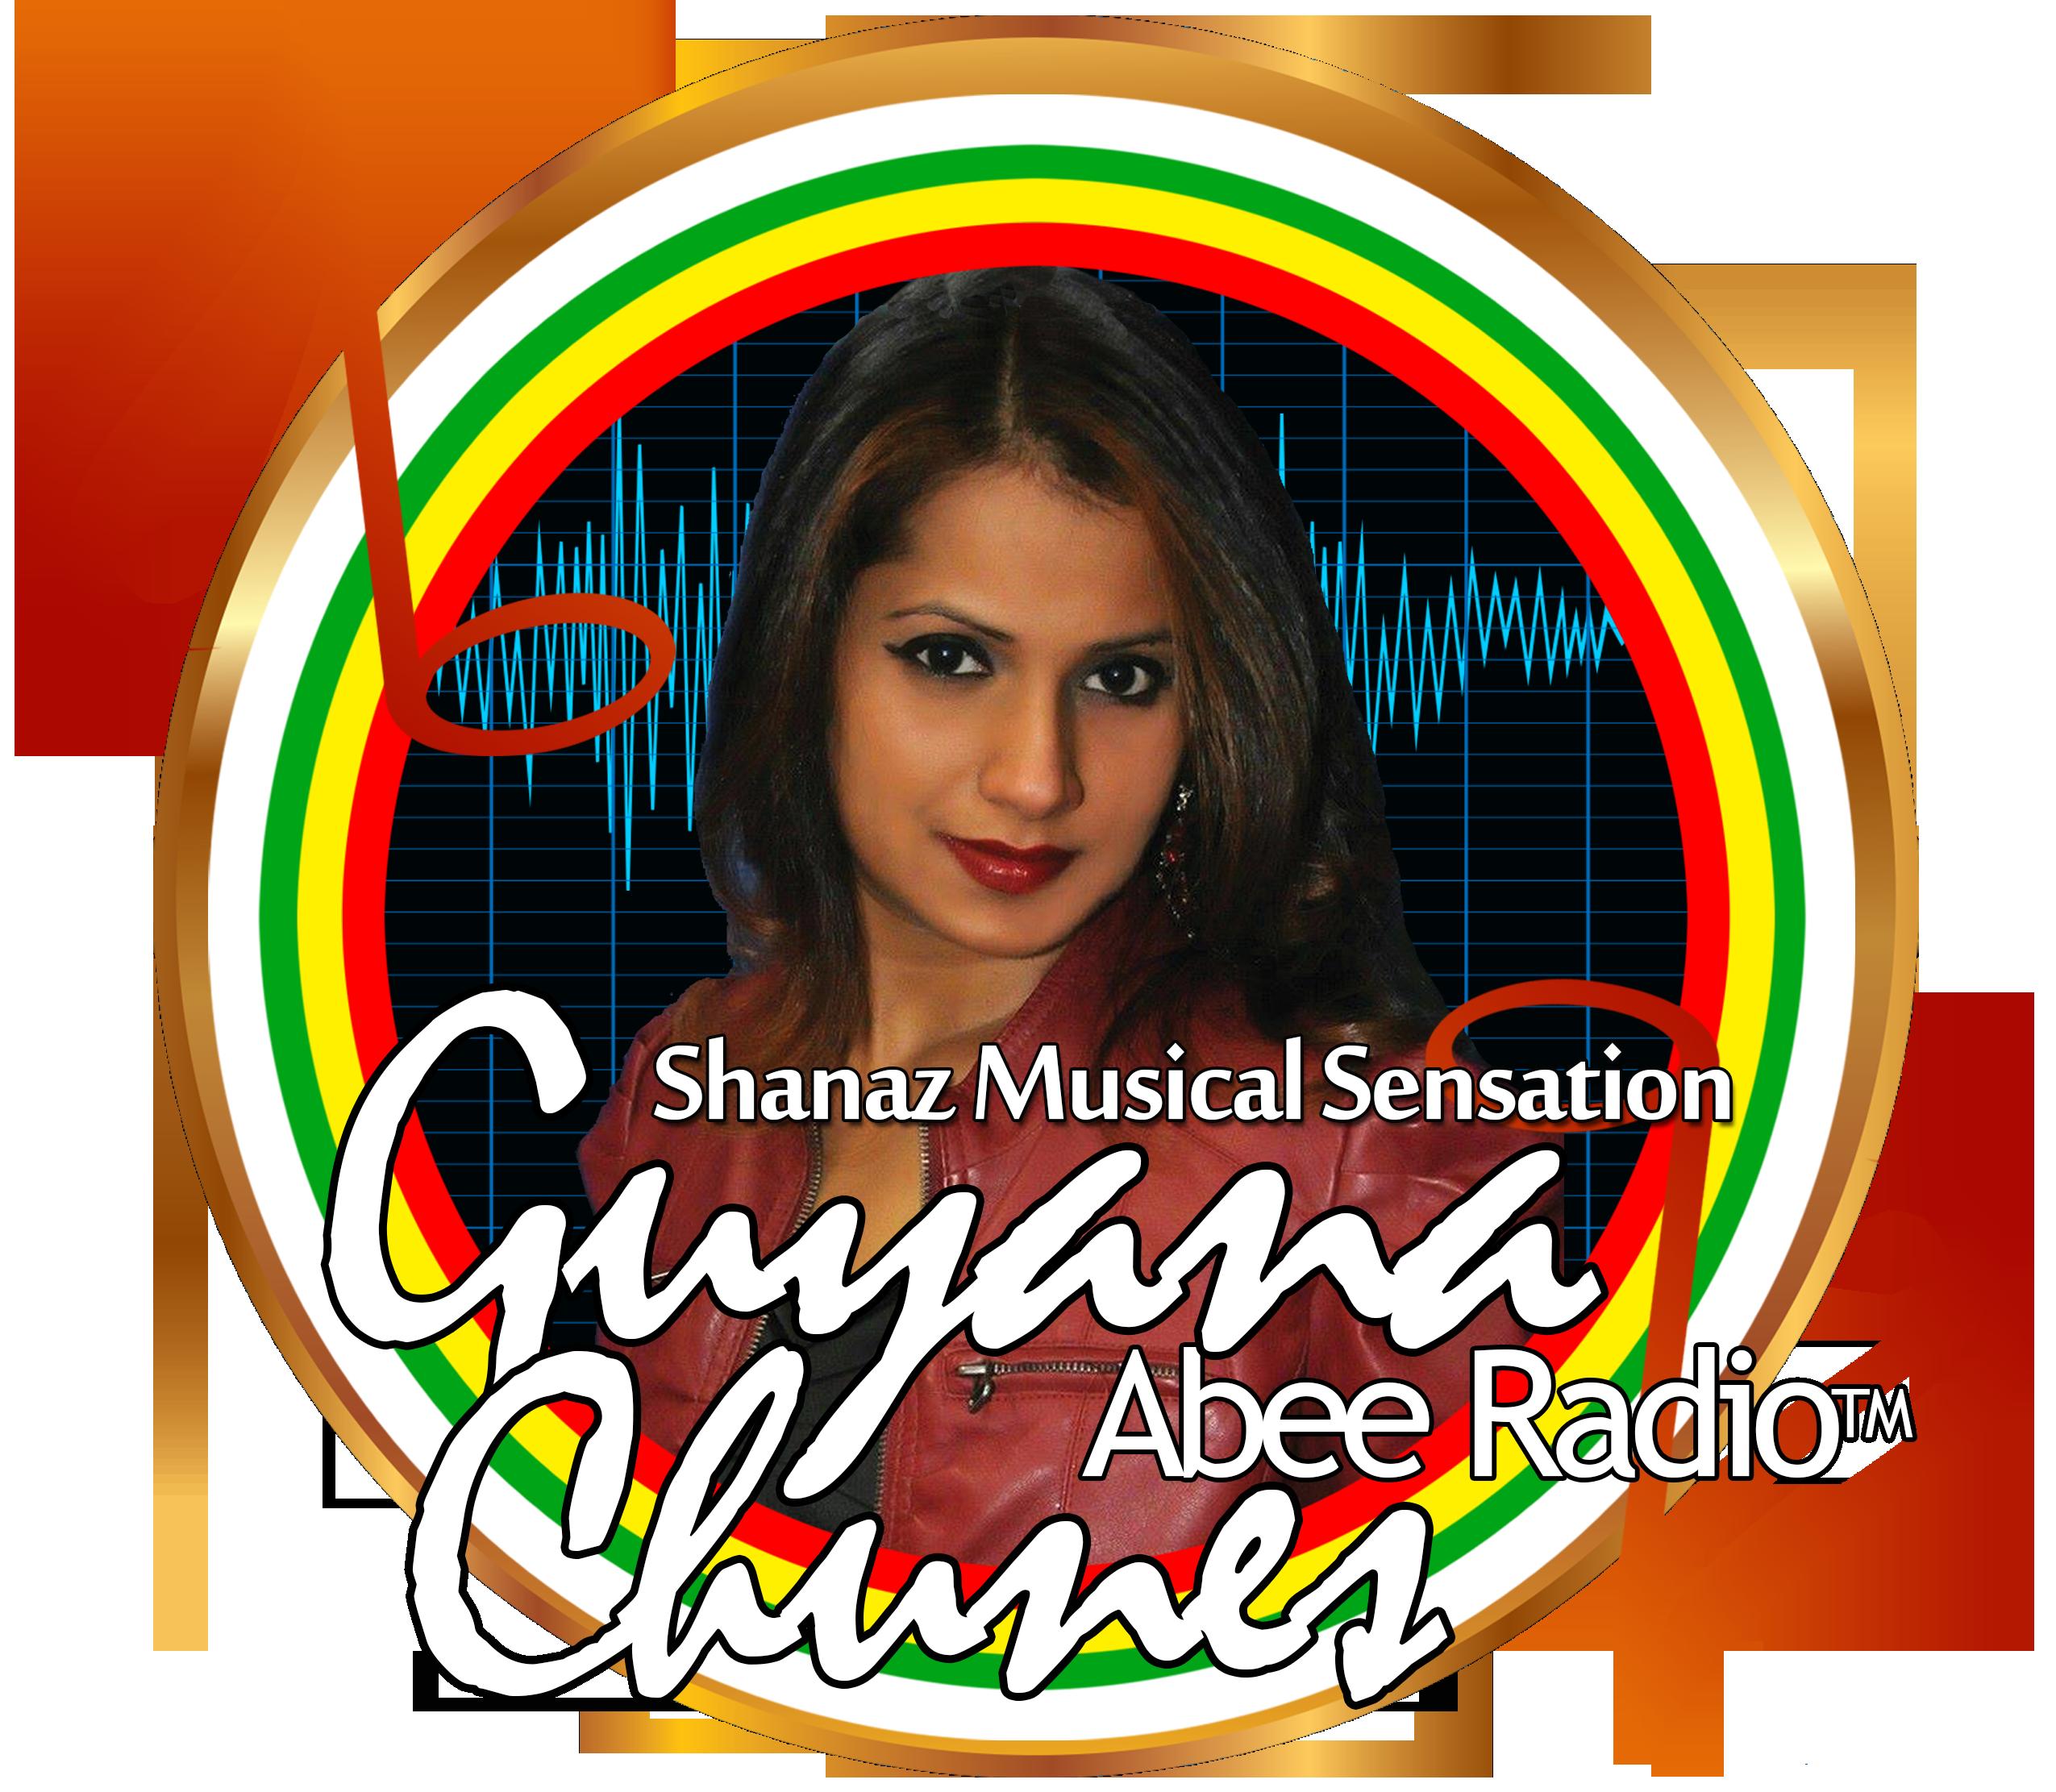 Shanaz Hussain